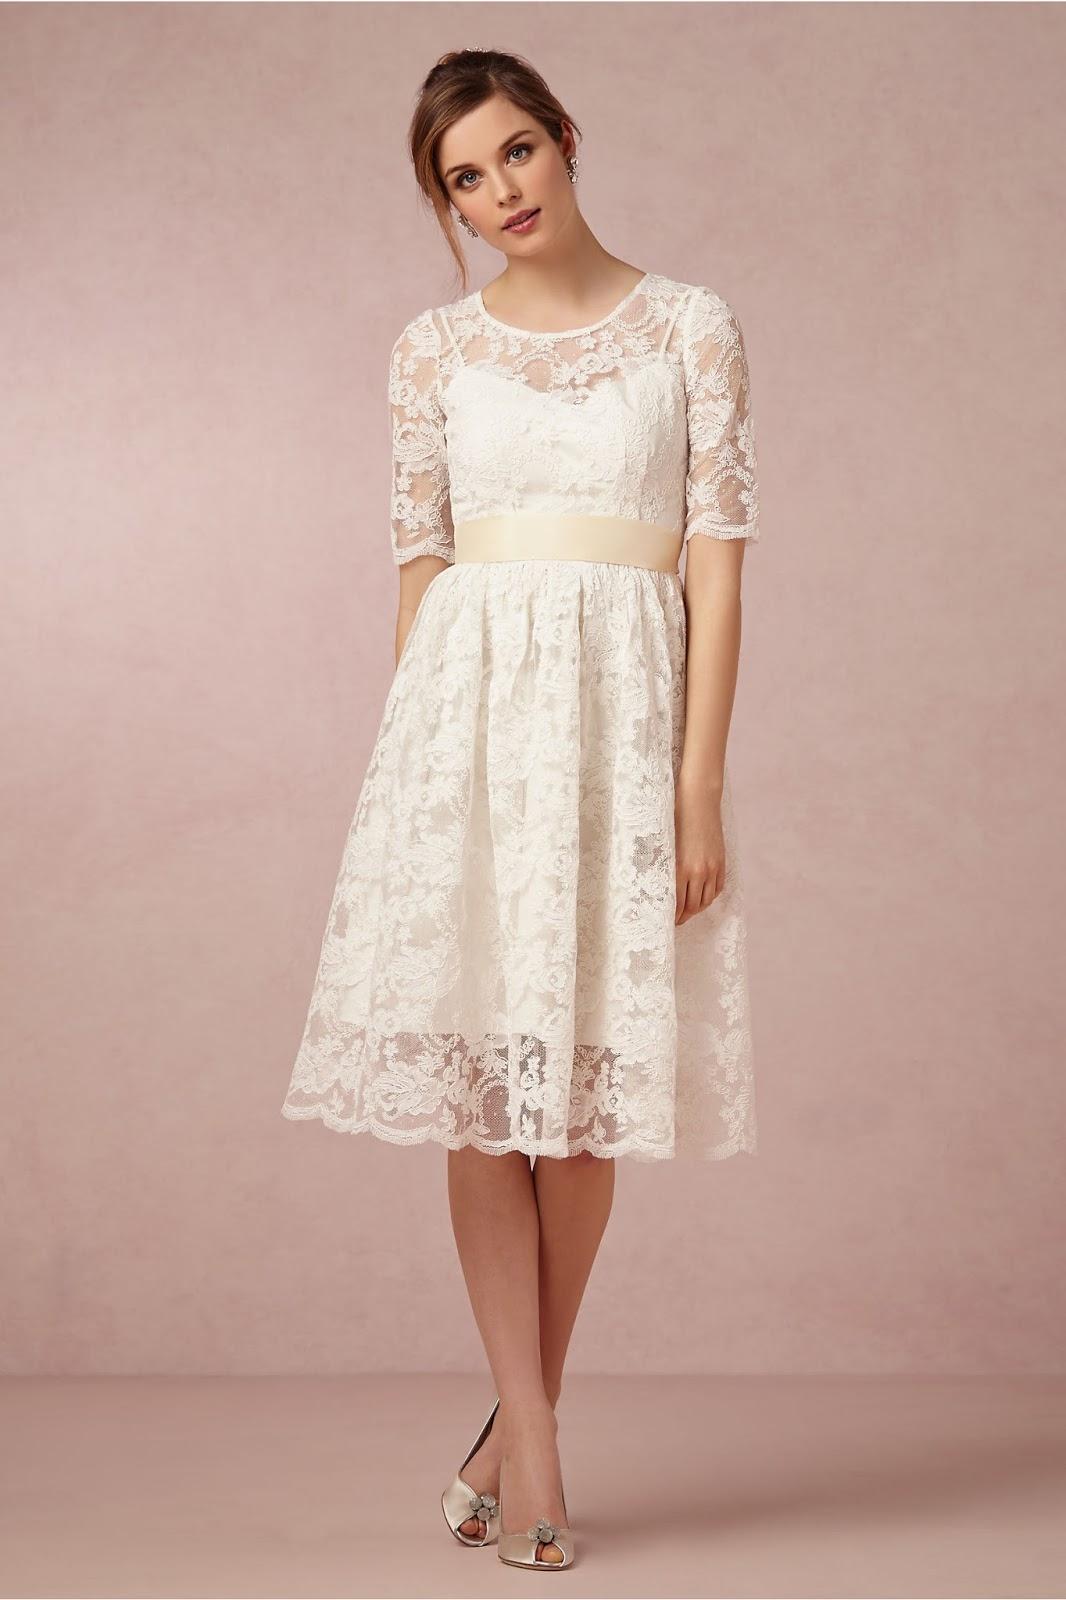 Petite Formal Dresses For Wedding 3